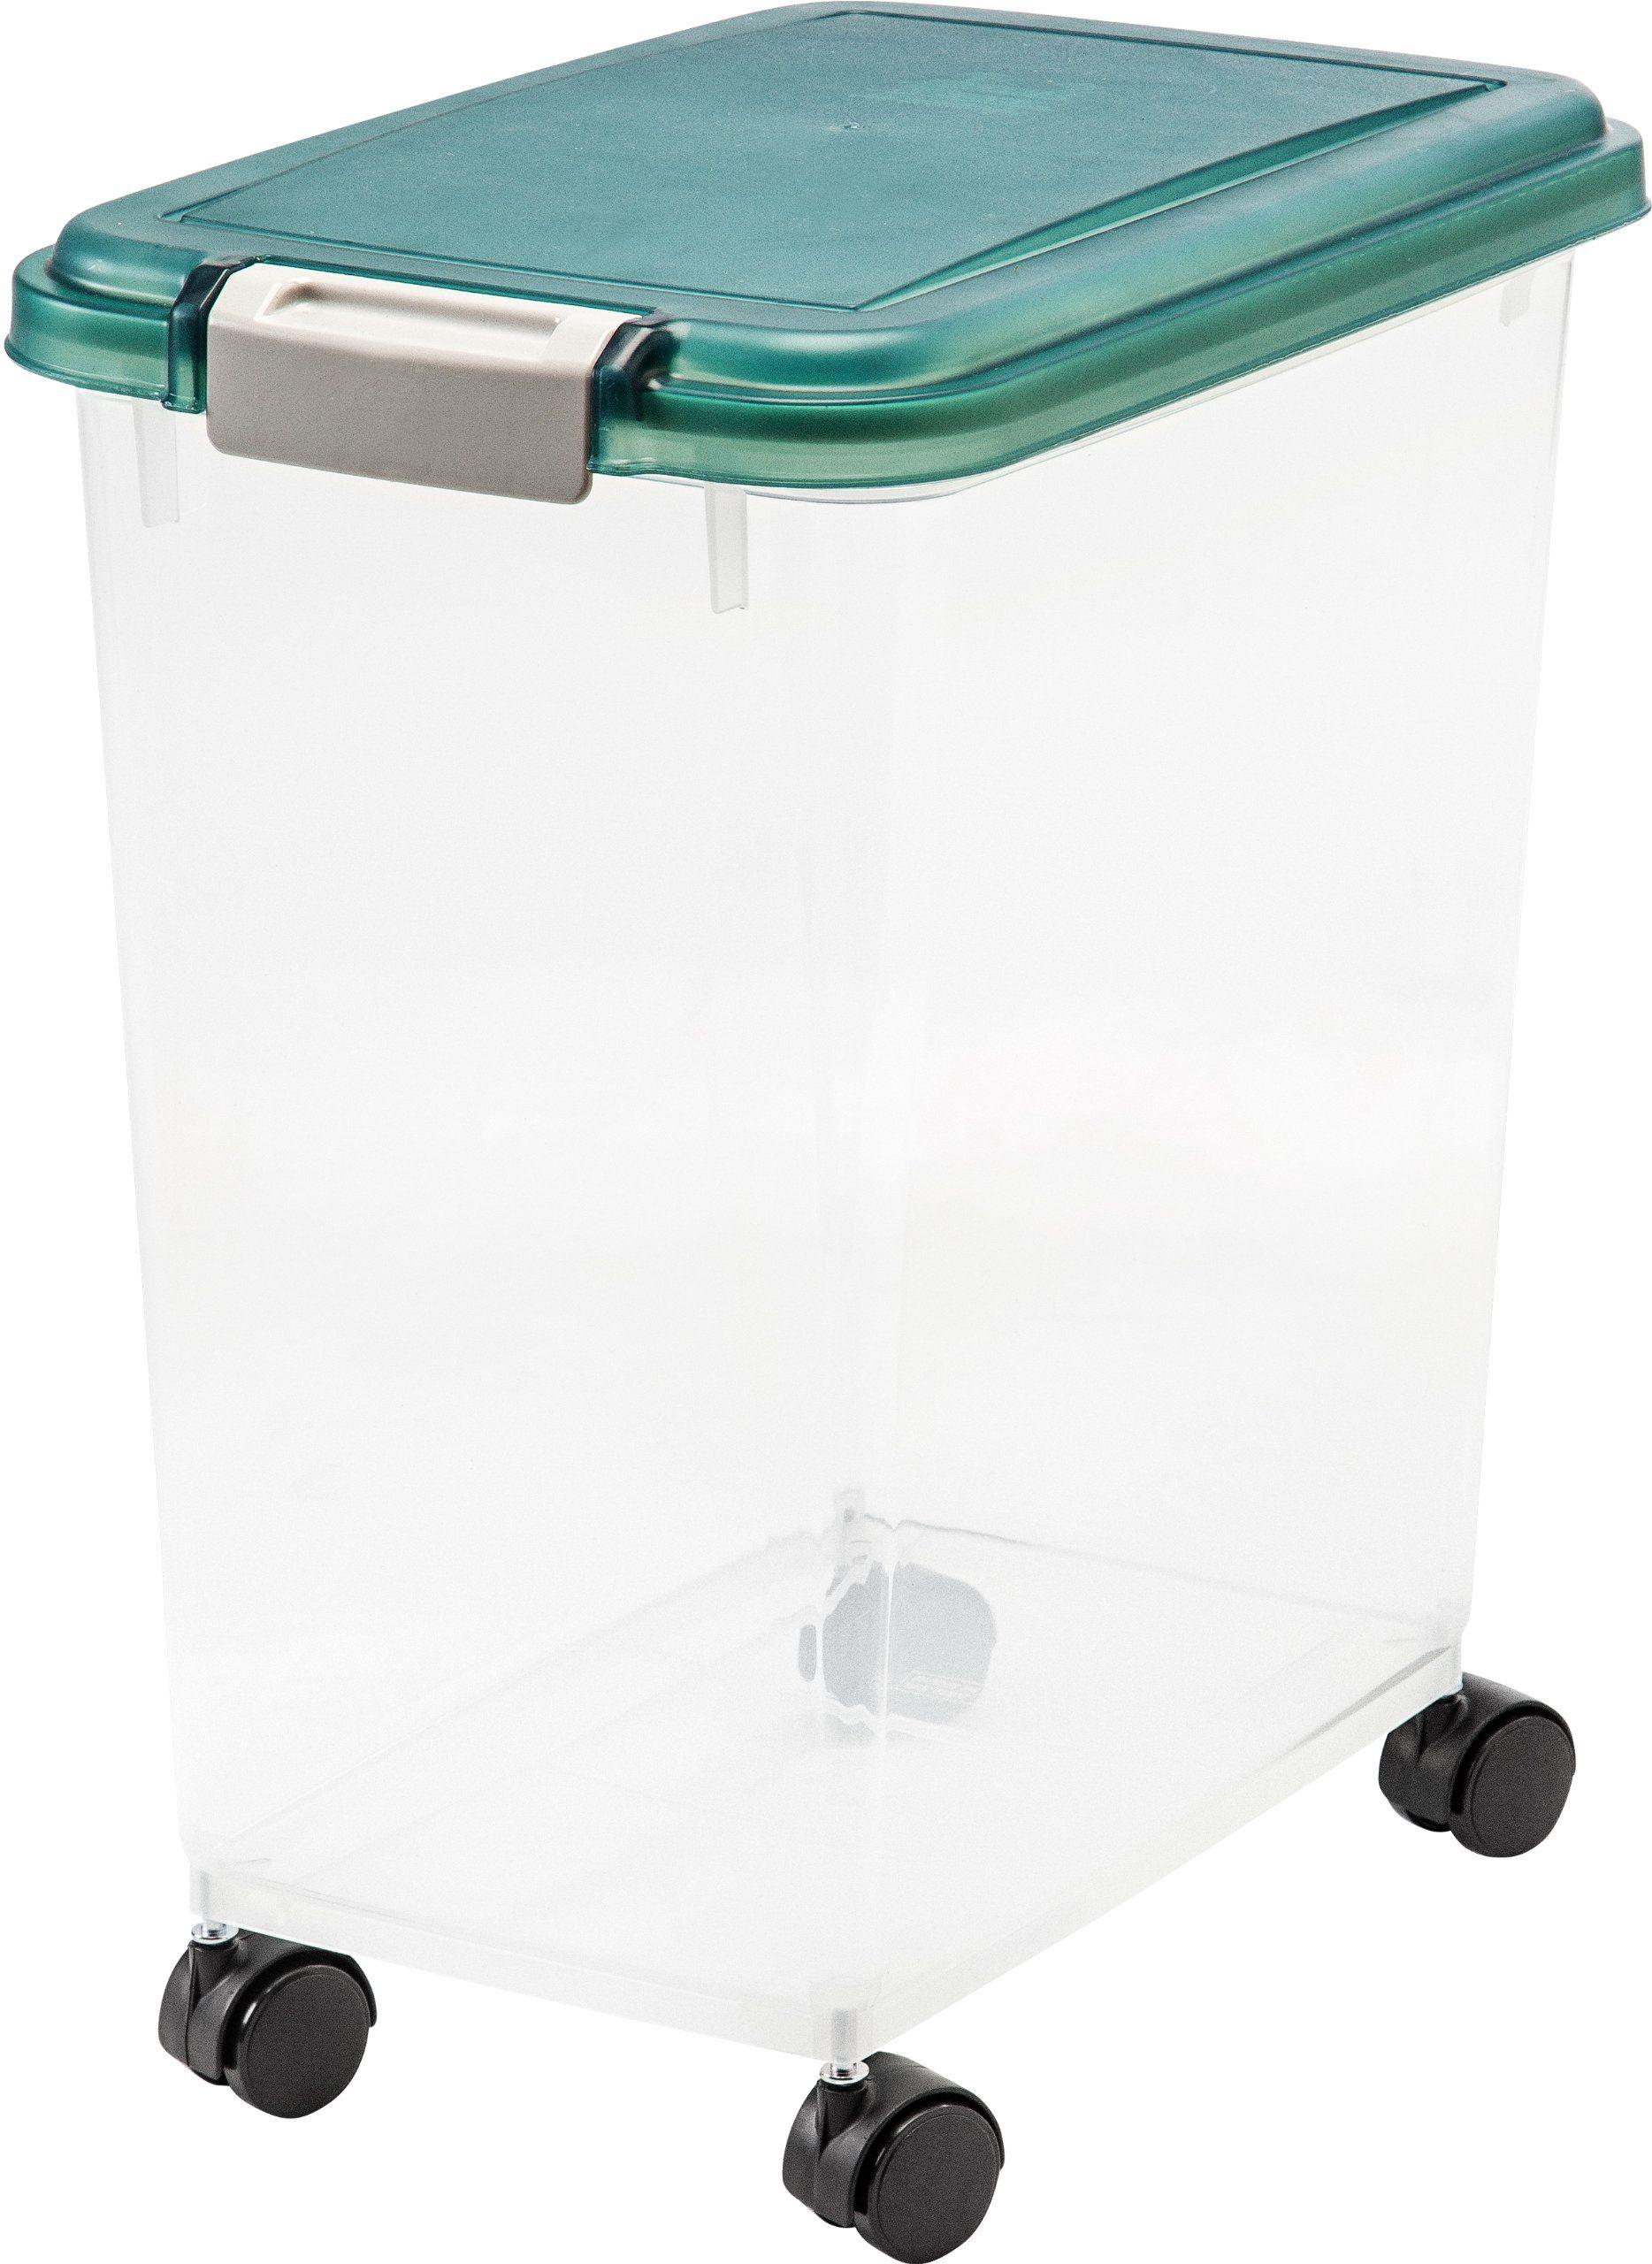 Iris Airtight Pet Food Storage Container Combo Pet Airtight